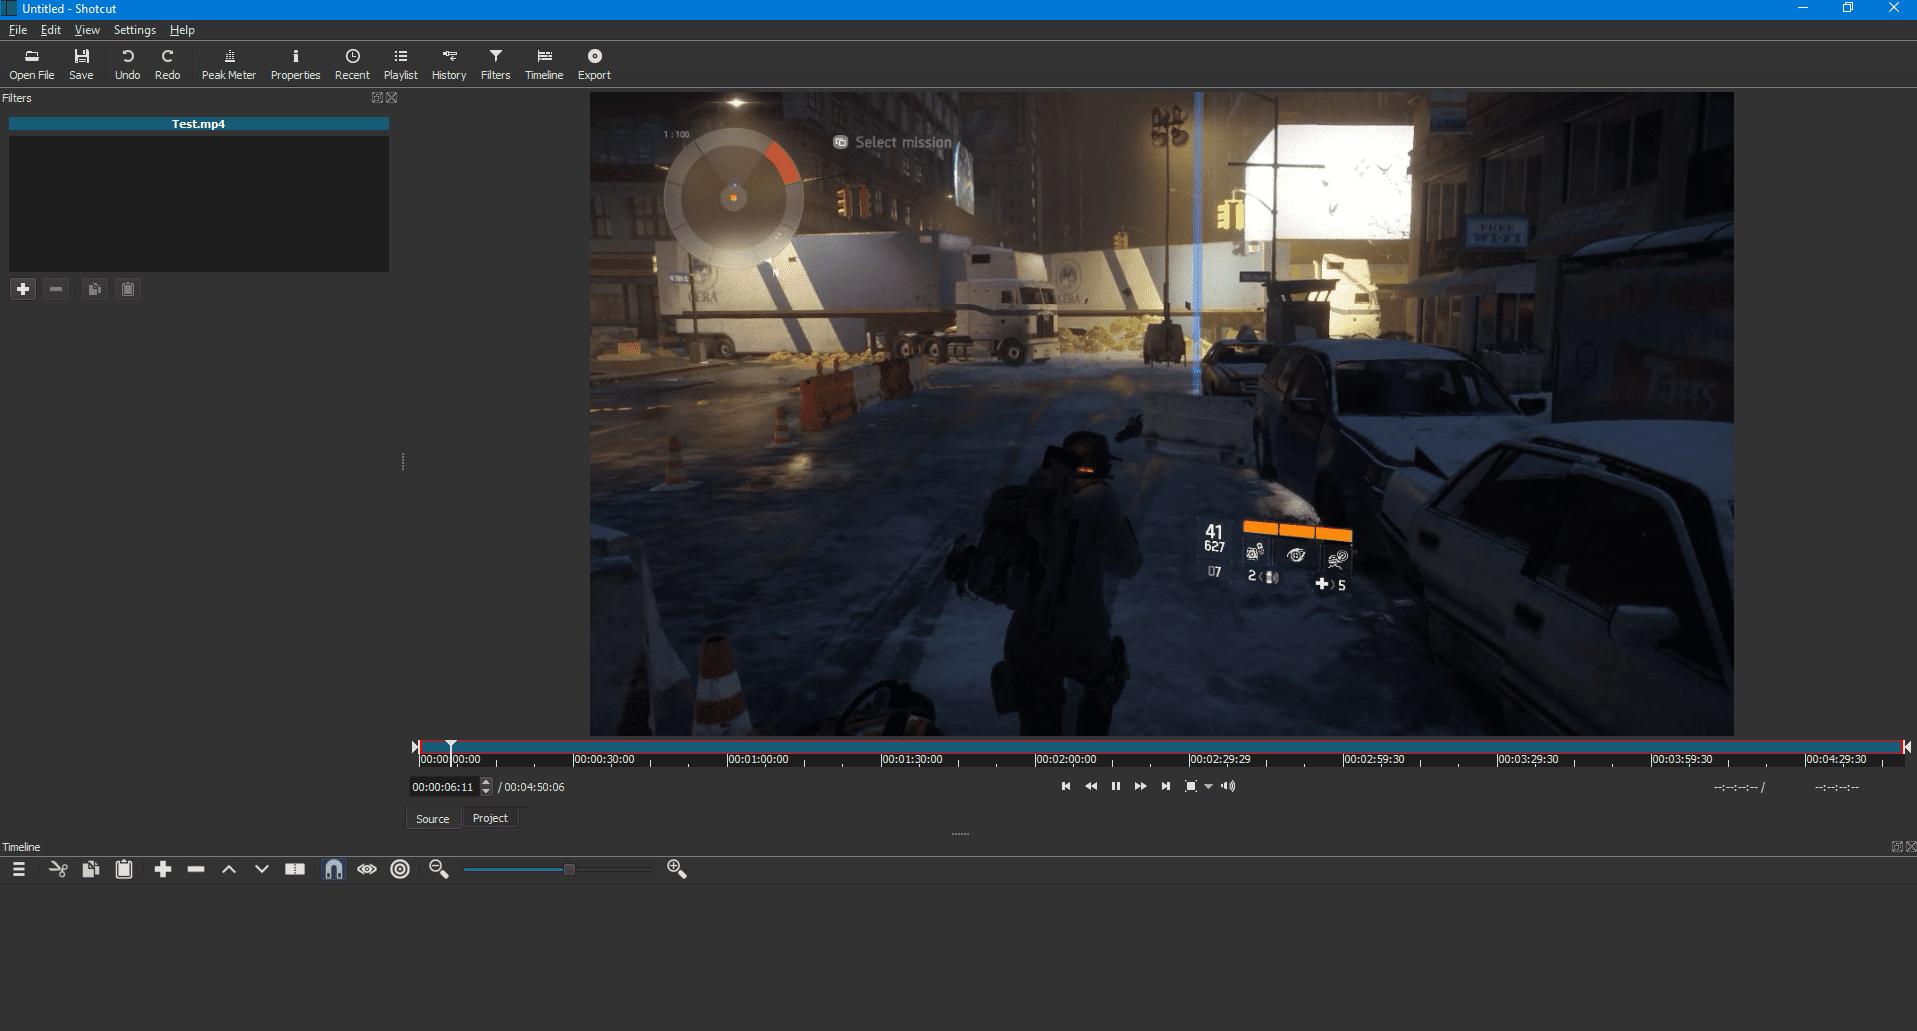 The Shotcut video editor interface.